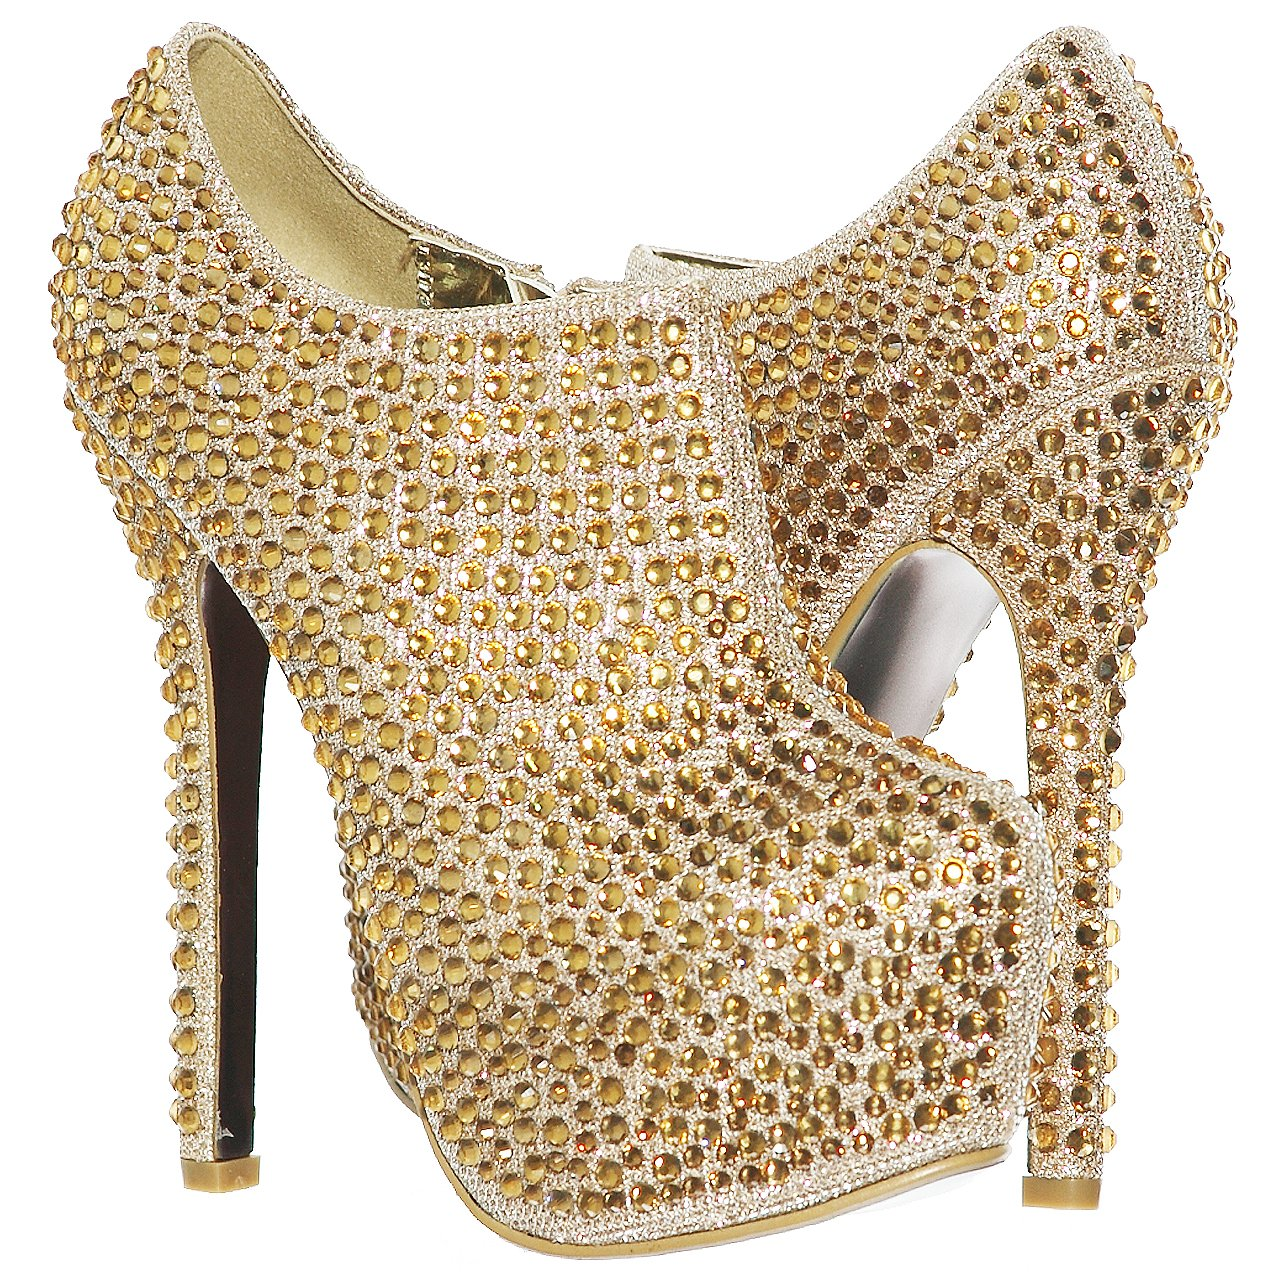 shoewhatever Womens Almond Toe Rhinestone Studded Stiletto High Heels Ankle Platform Pumps